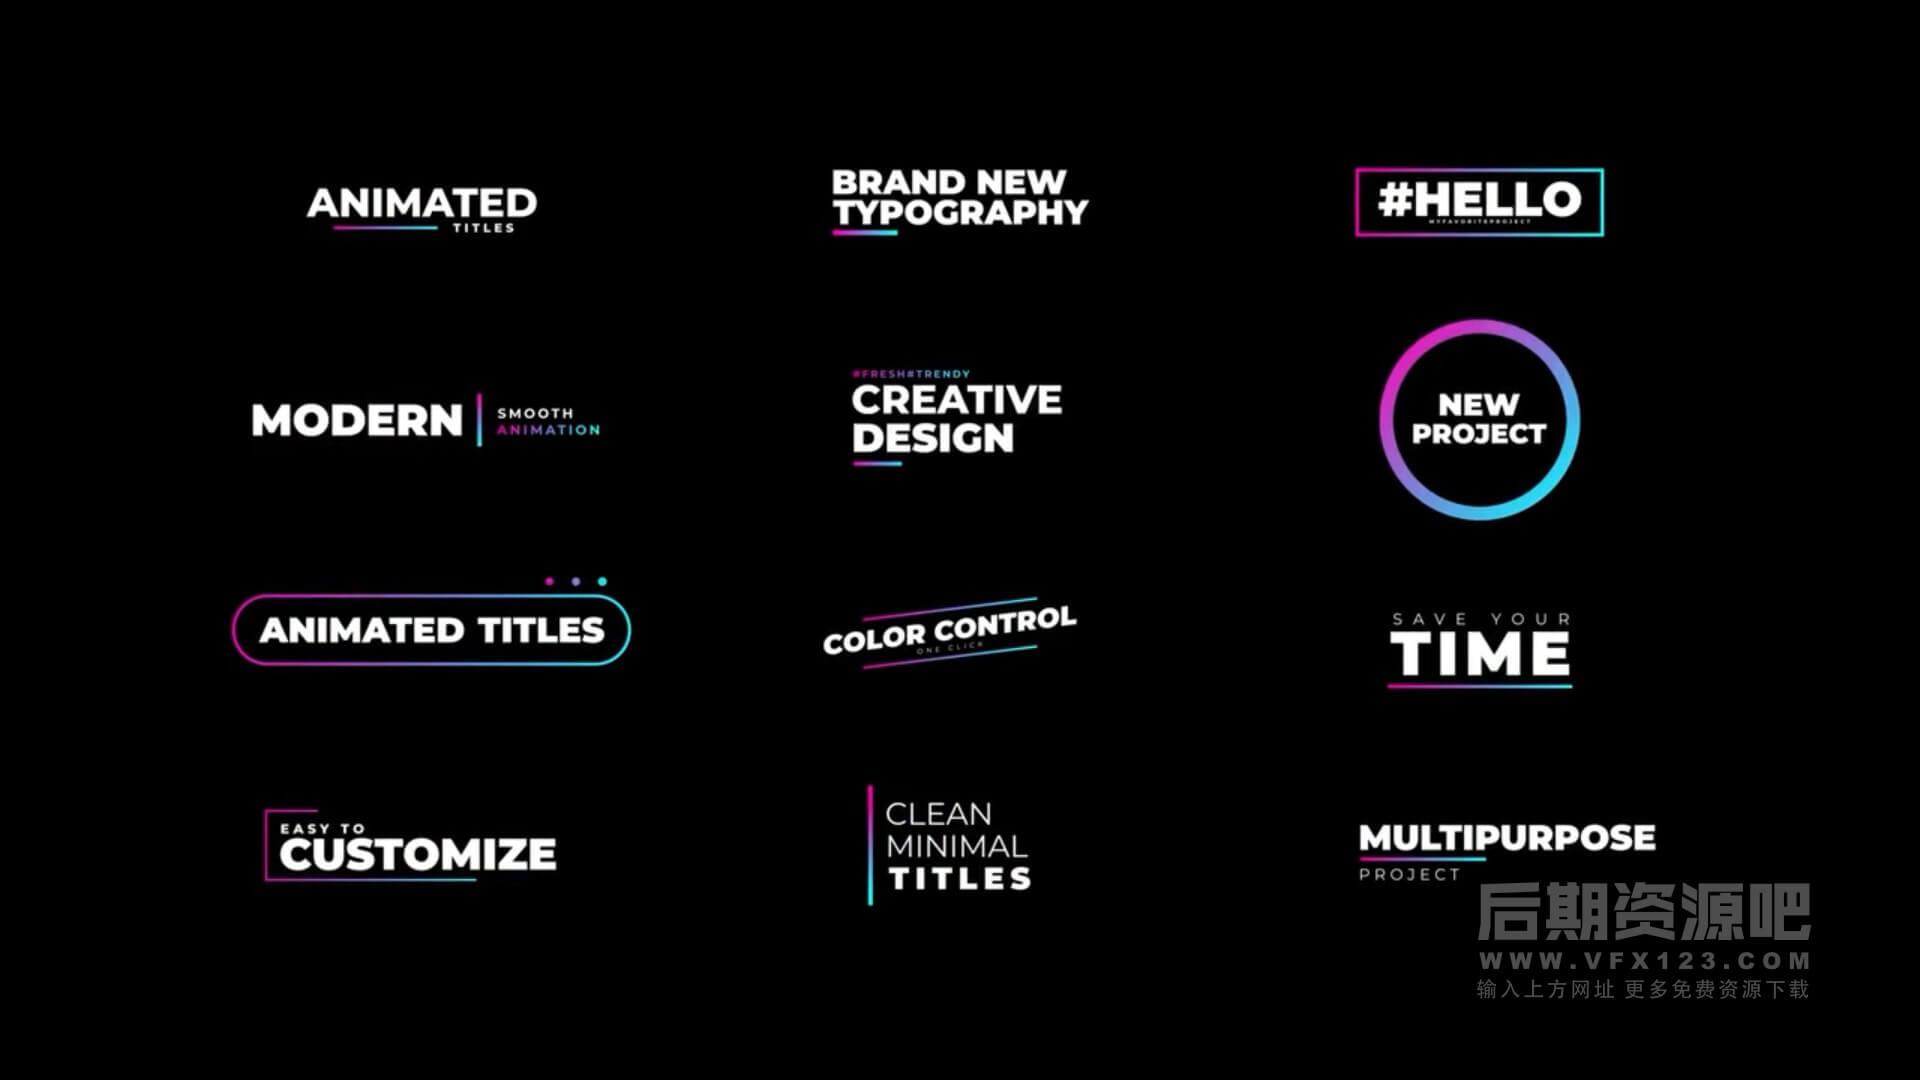 fcpx标题插件 12组现代流行彩色渐变标题预设 Modern Titles